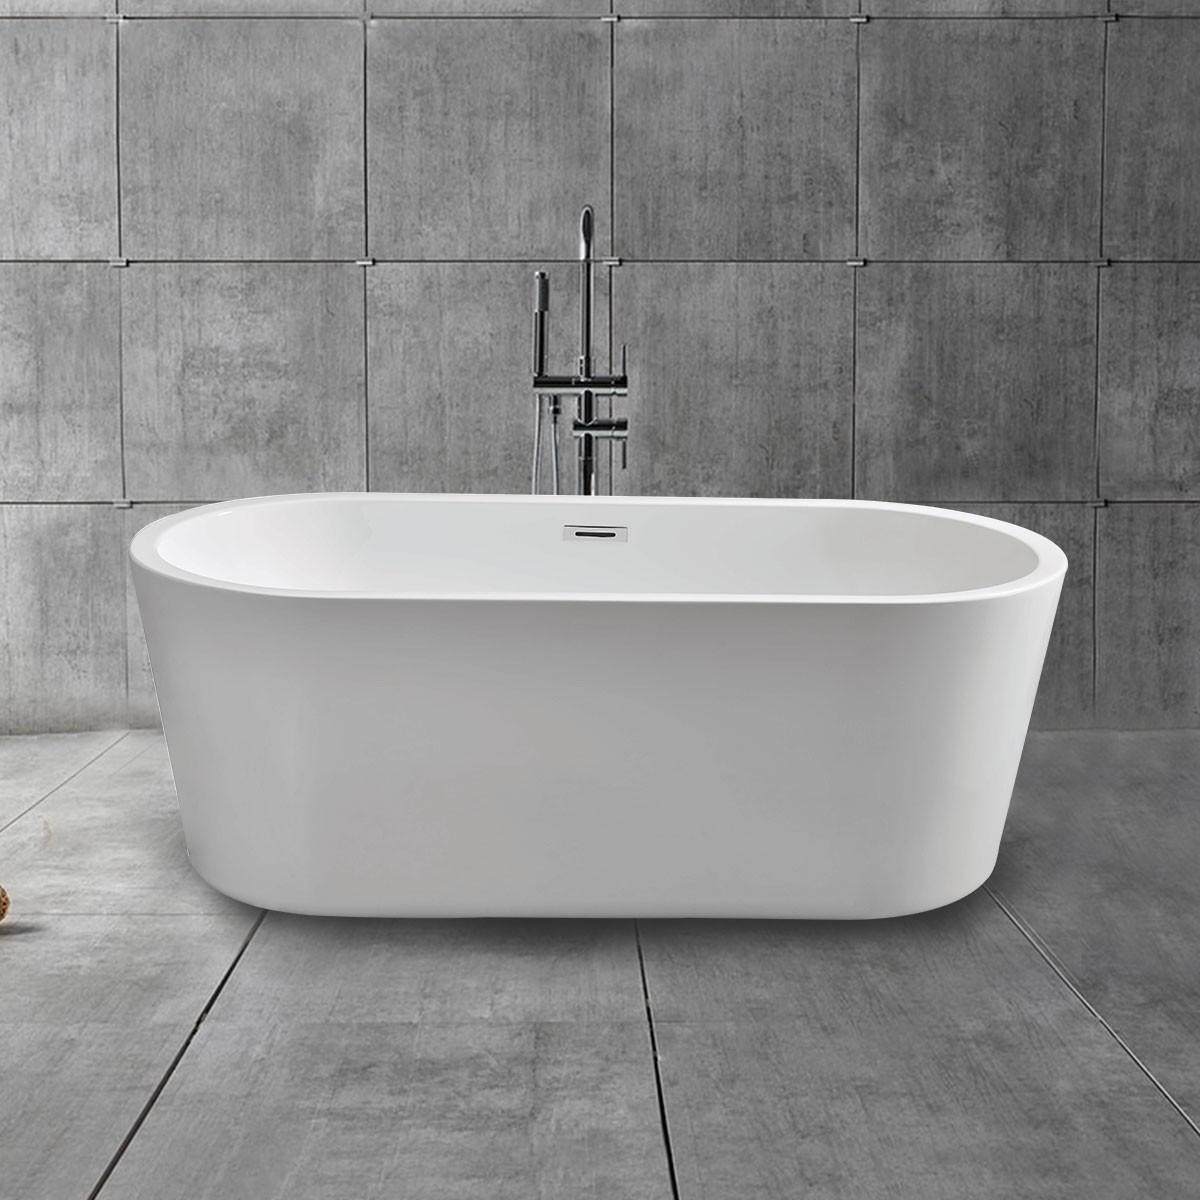 67 In Acrylic White Freestanding Bathtub (DK-MEC3004B)